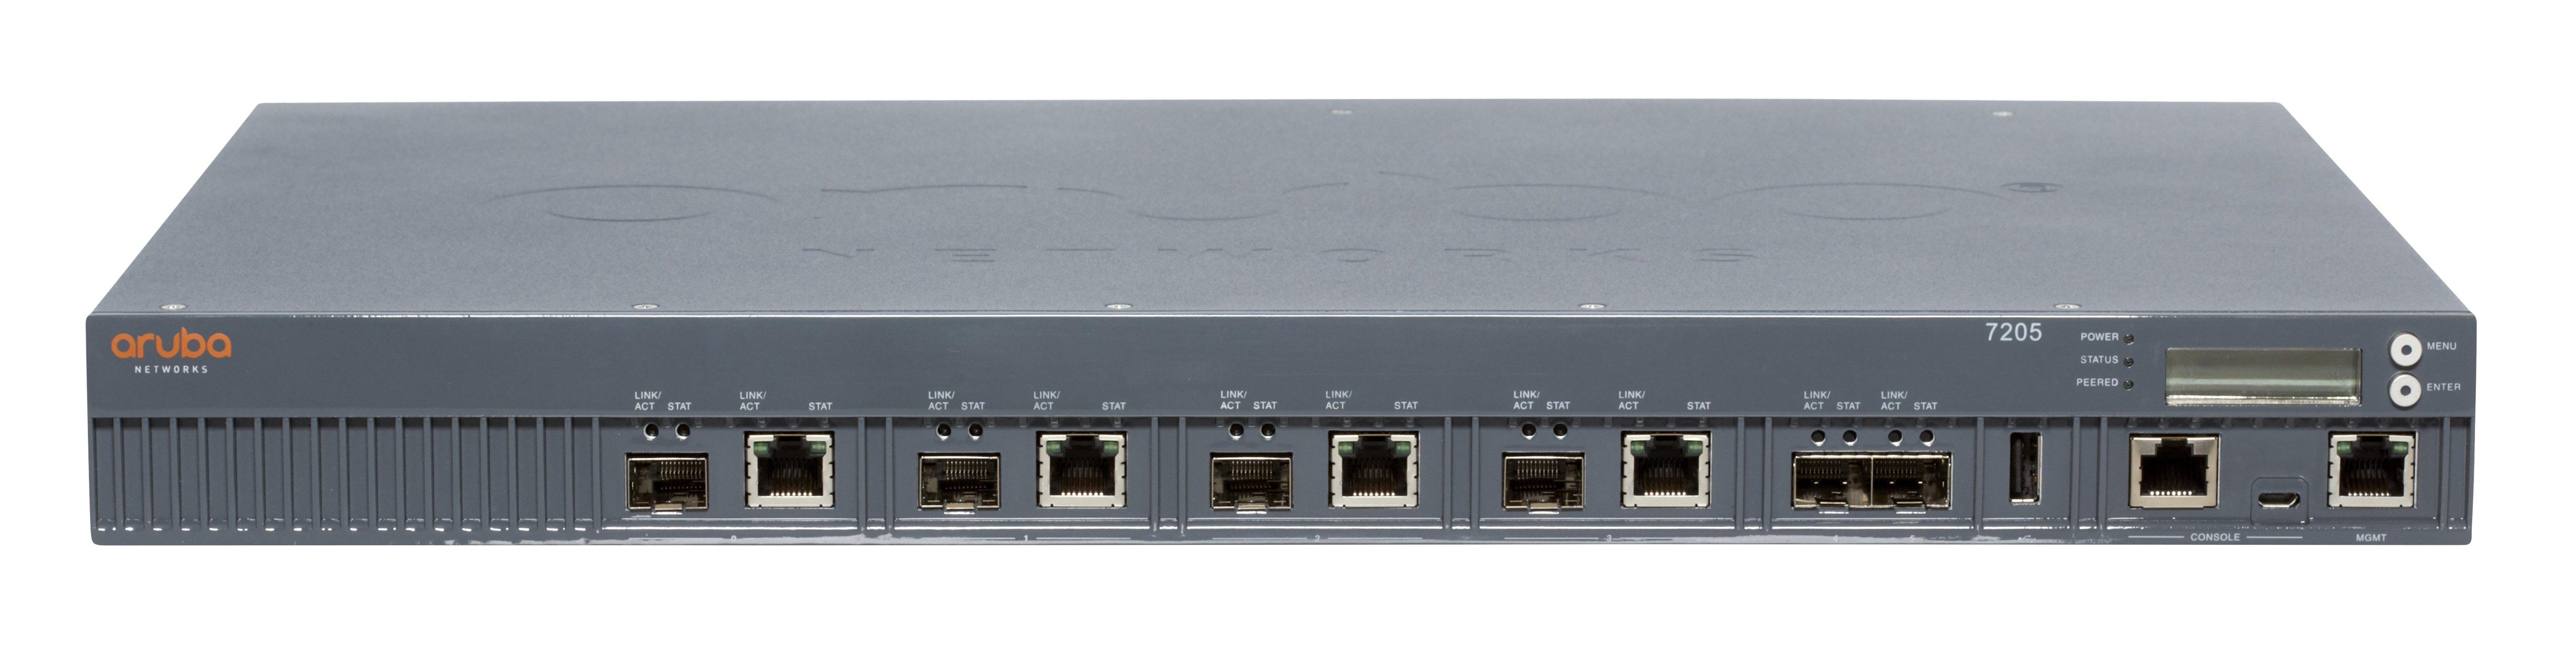 Aruba 7205 Wireless LAN Controller - 4 x Network (RJ-45)